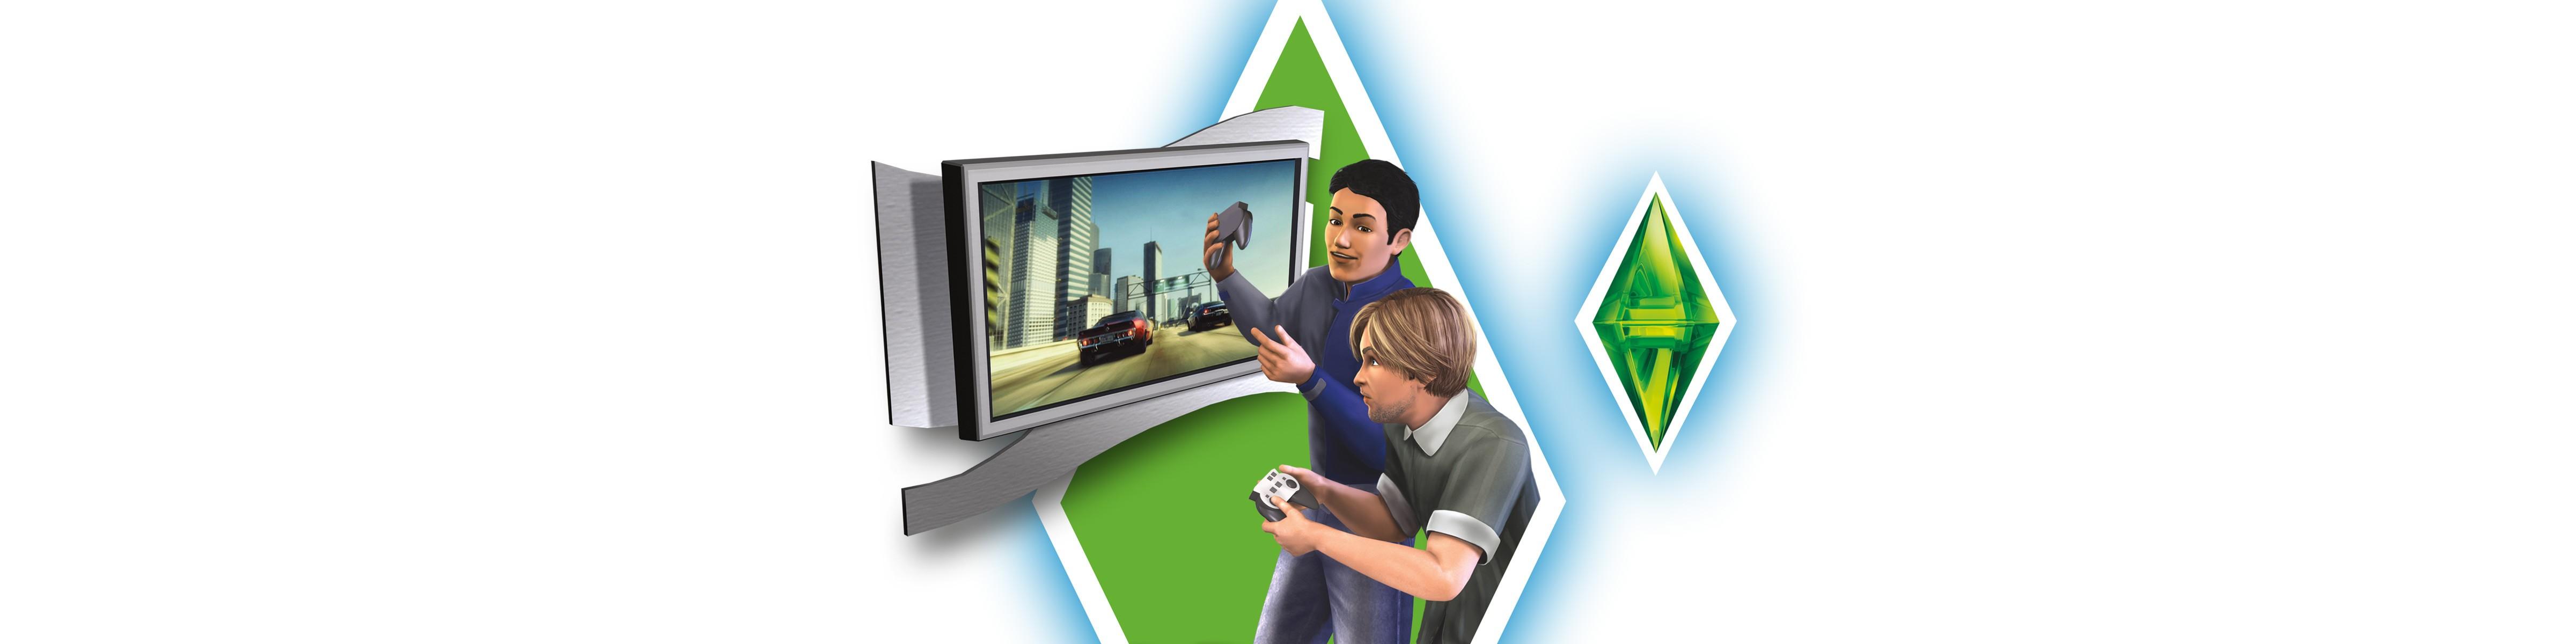 The Sims™ 3 Expansion Bundle